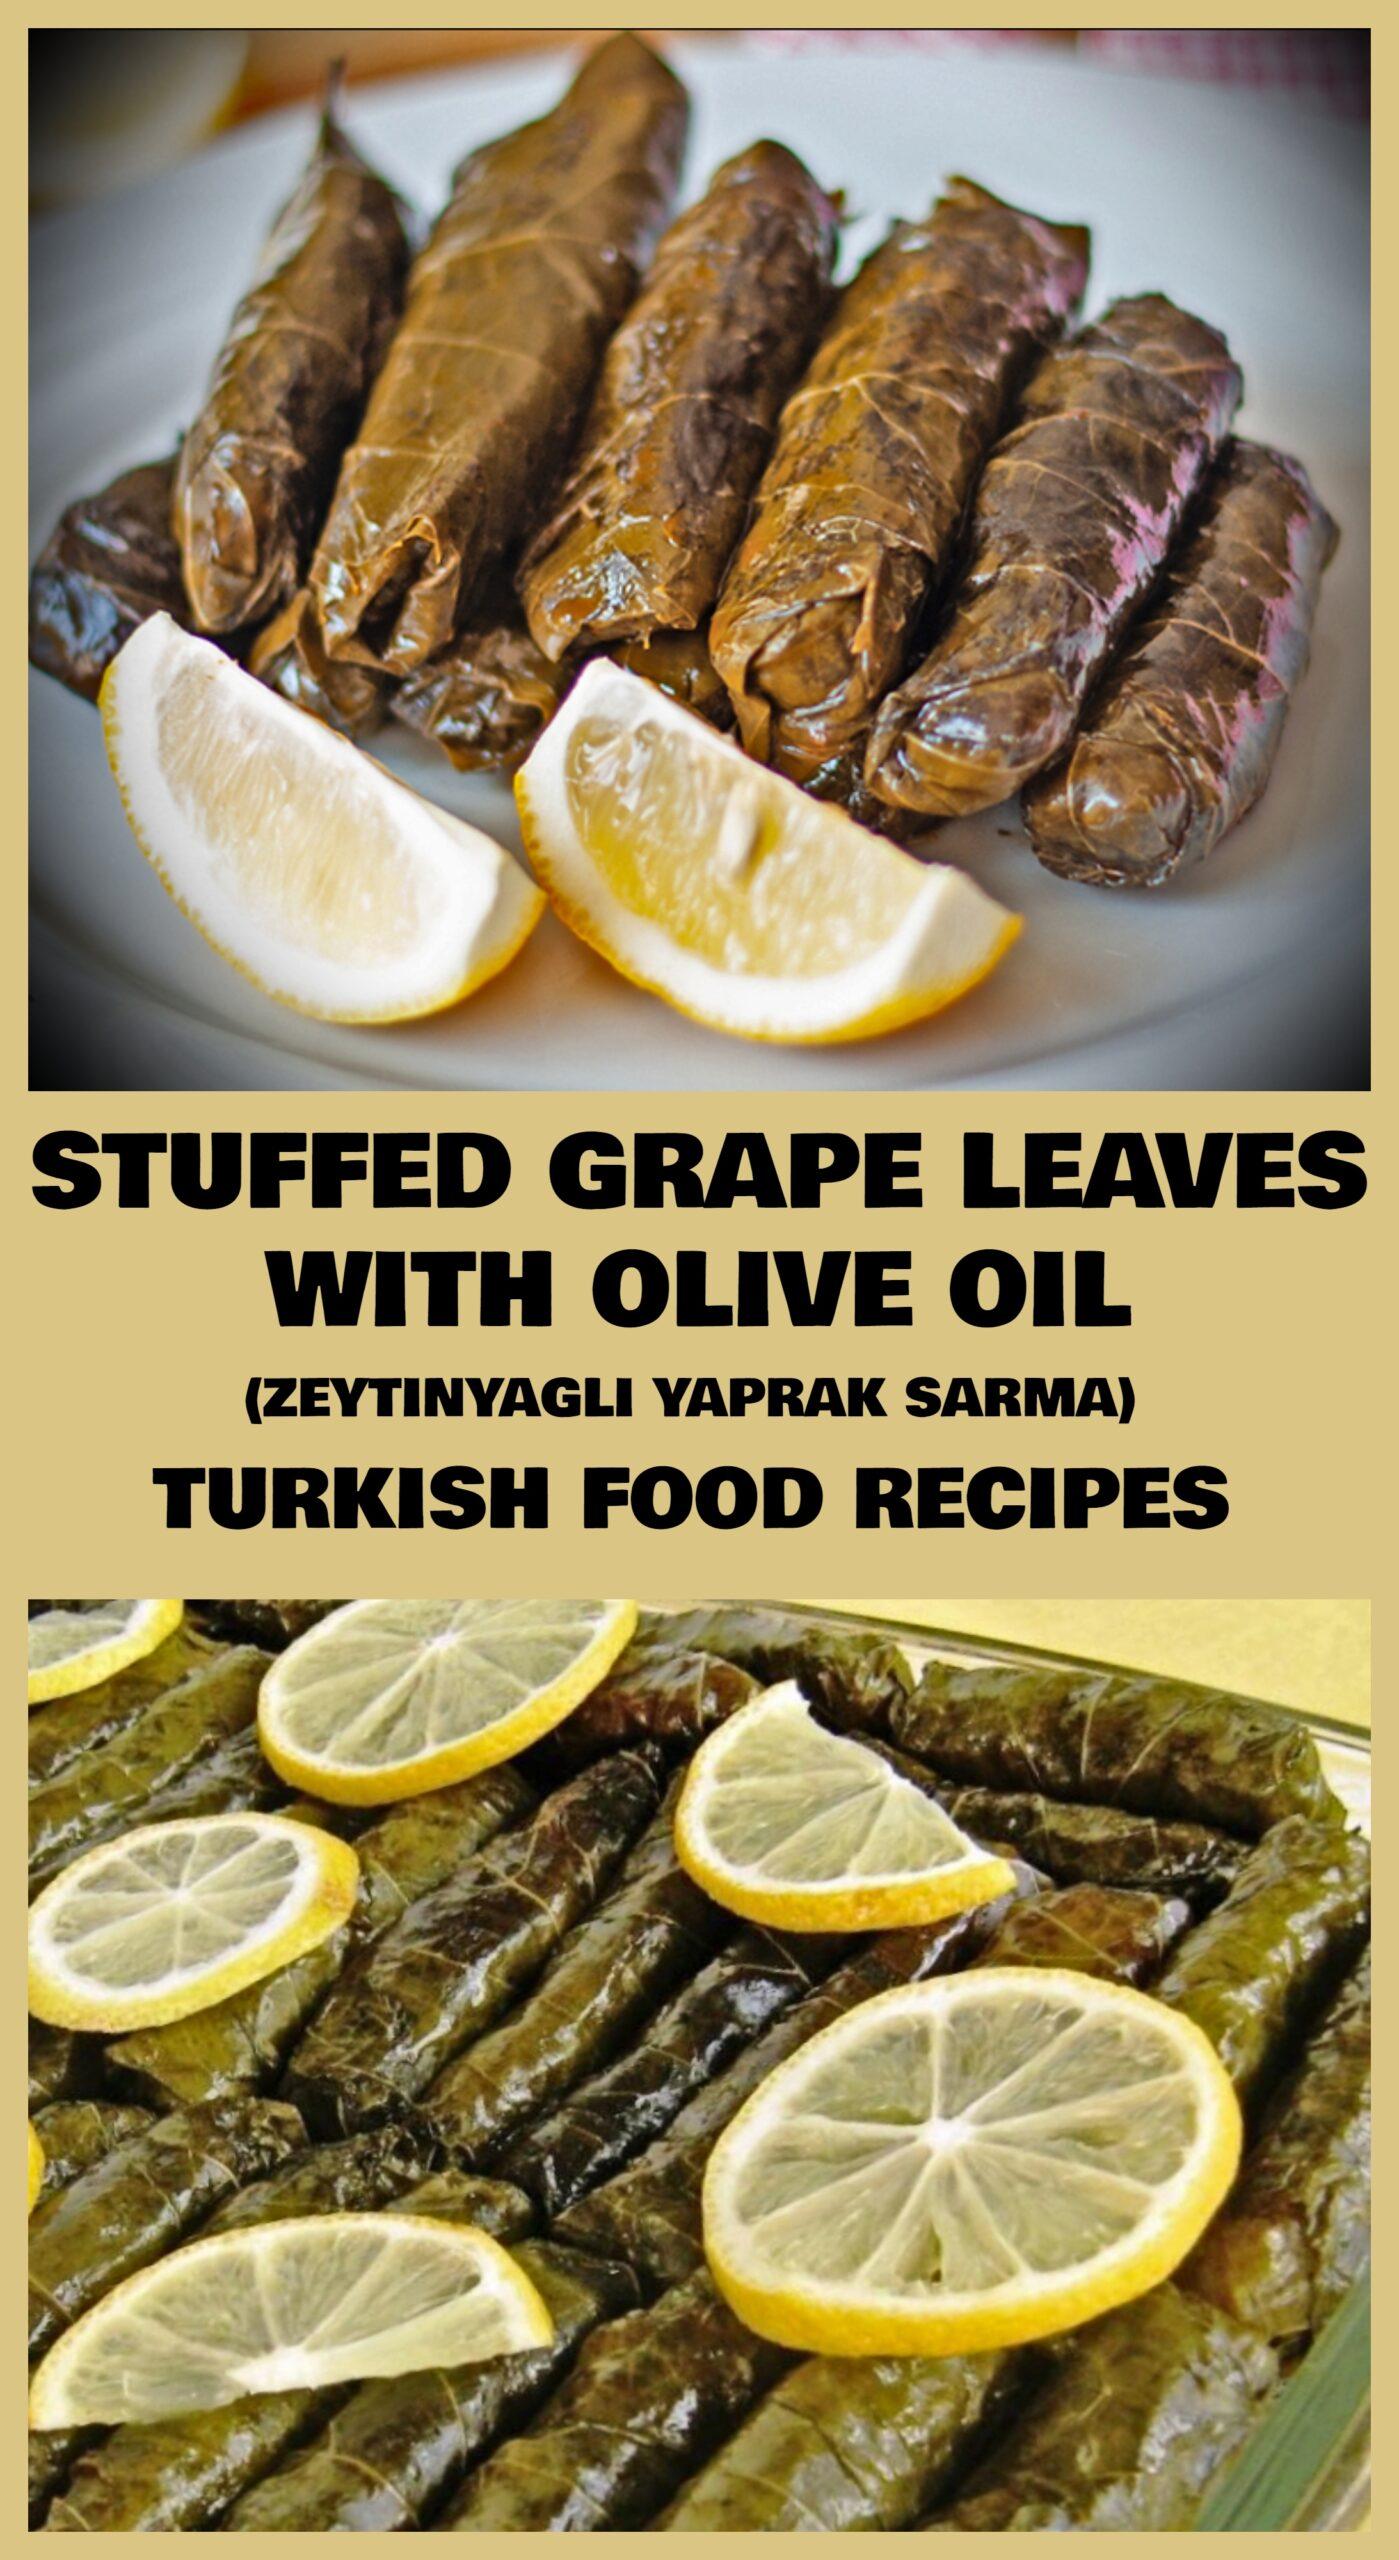 Stuffed Grape Leaves With Olive Oil - Zeytinyagli Yaprak Sarma Recipe